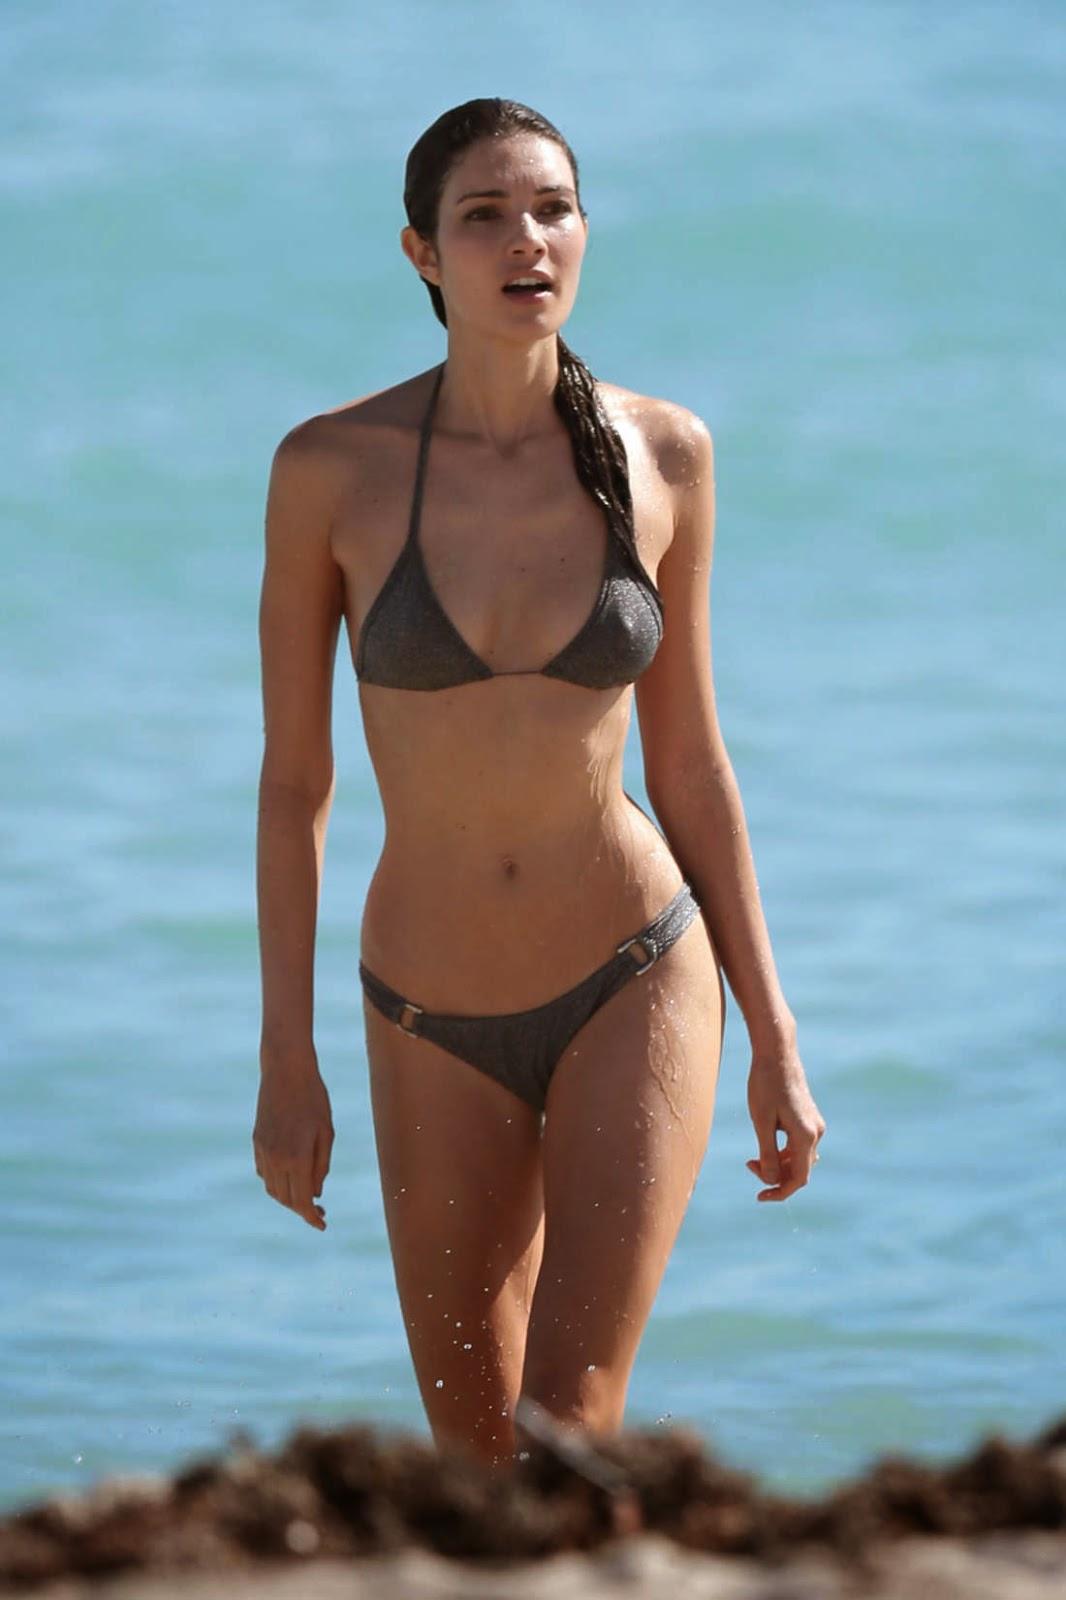 Bikini nipple pokies